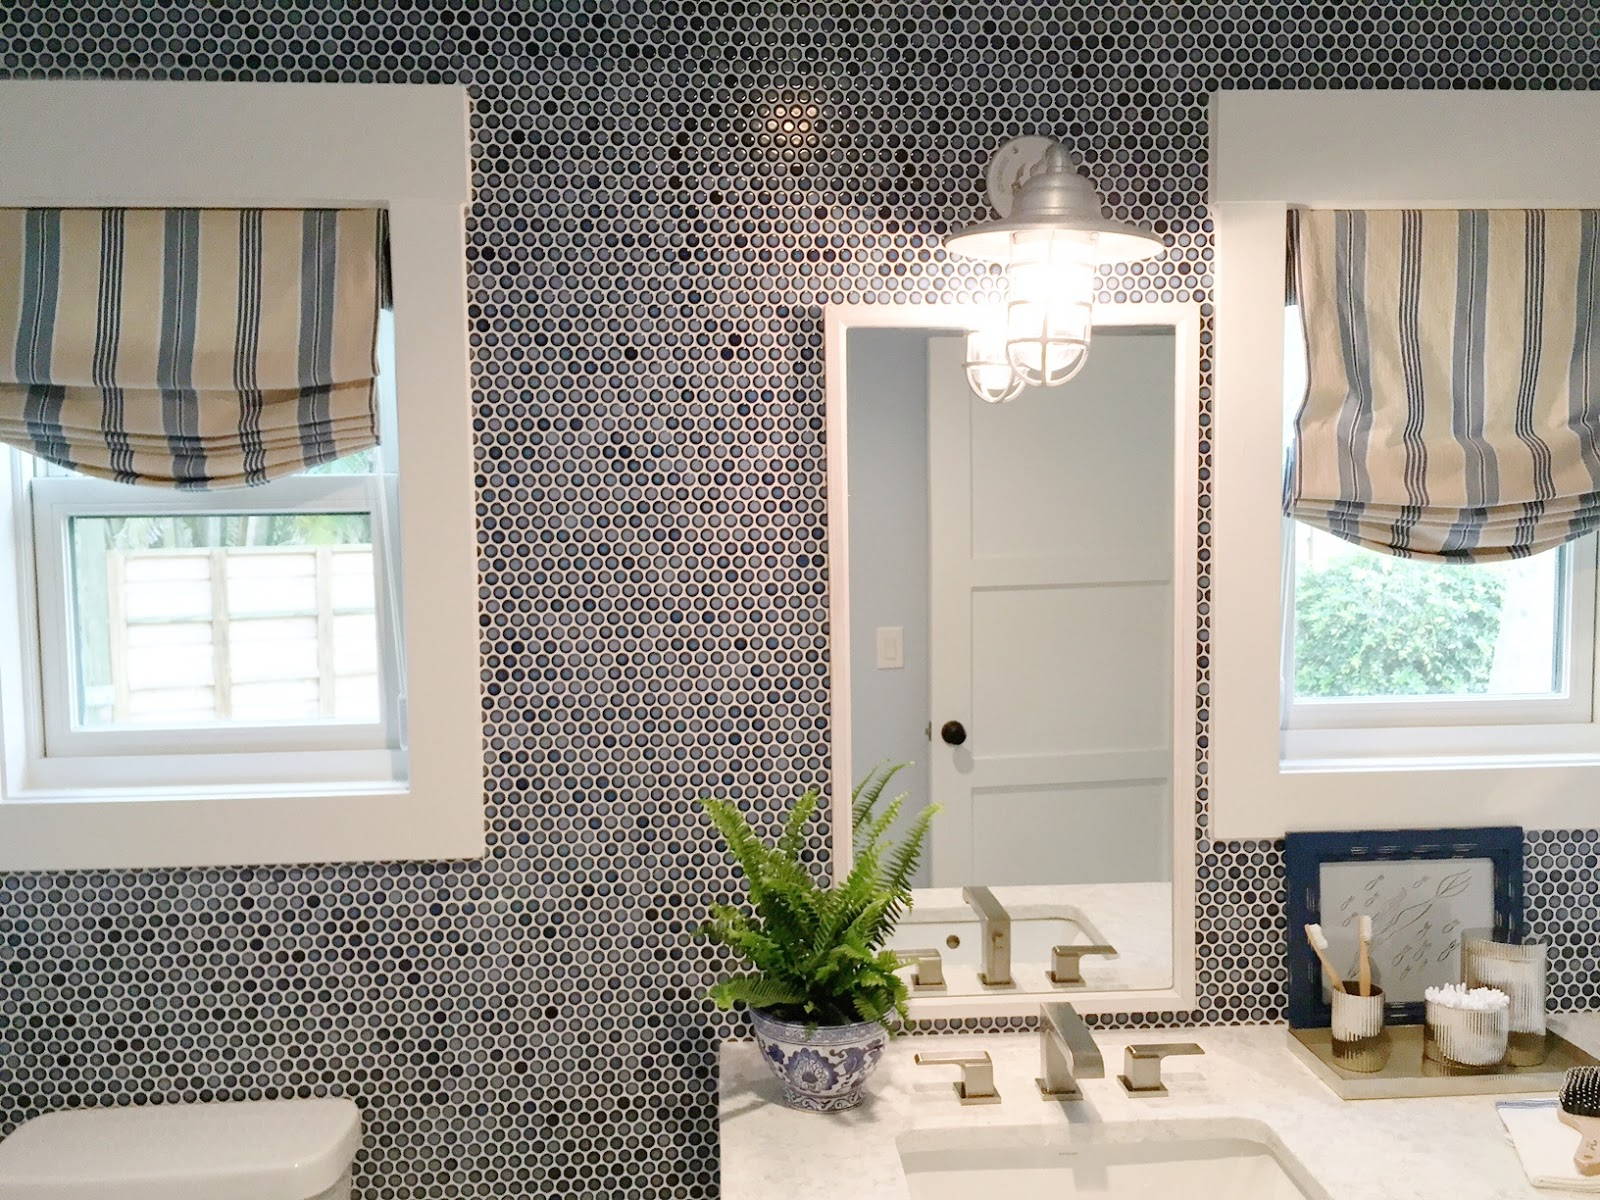 Popular Navy blue penny tile in bathroom